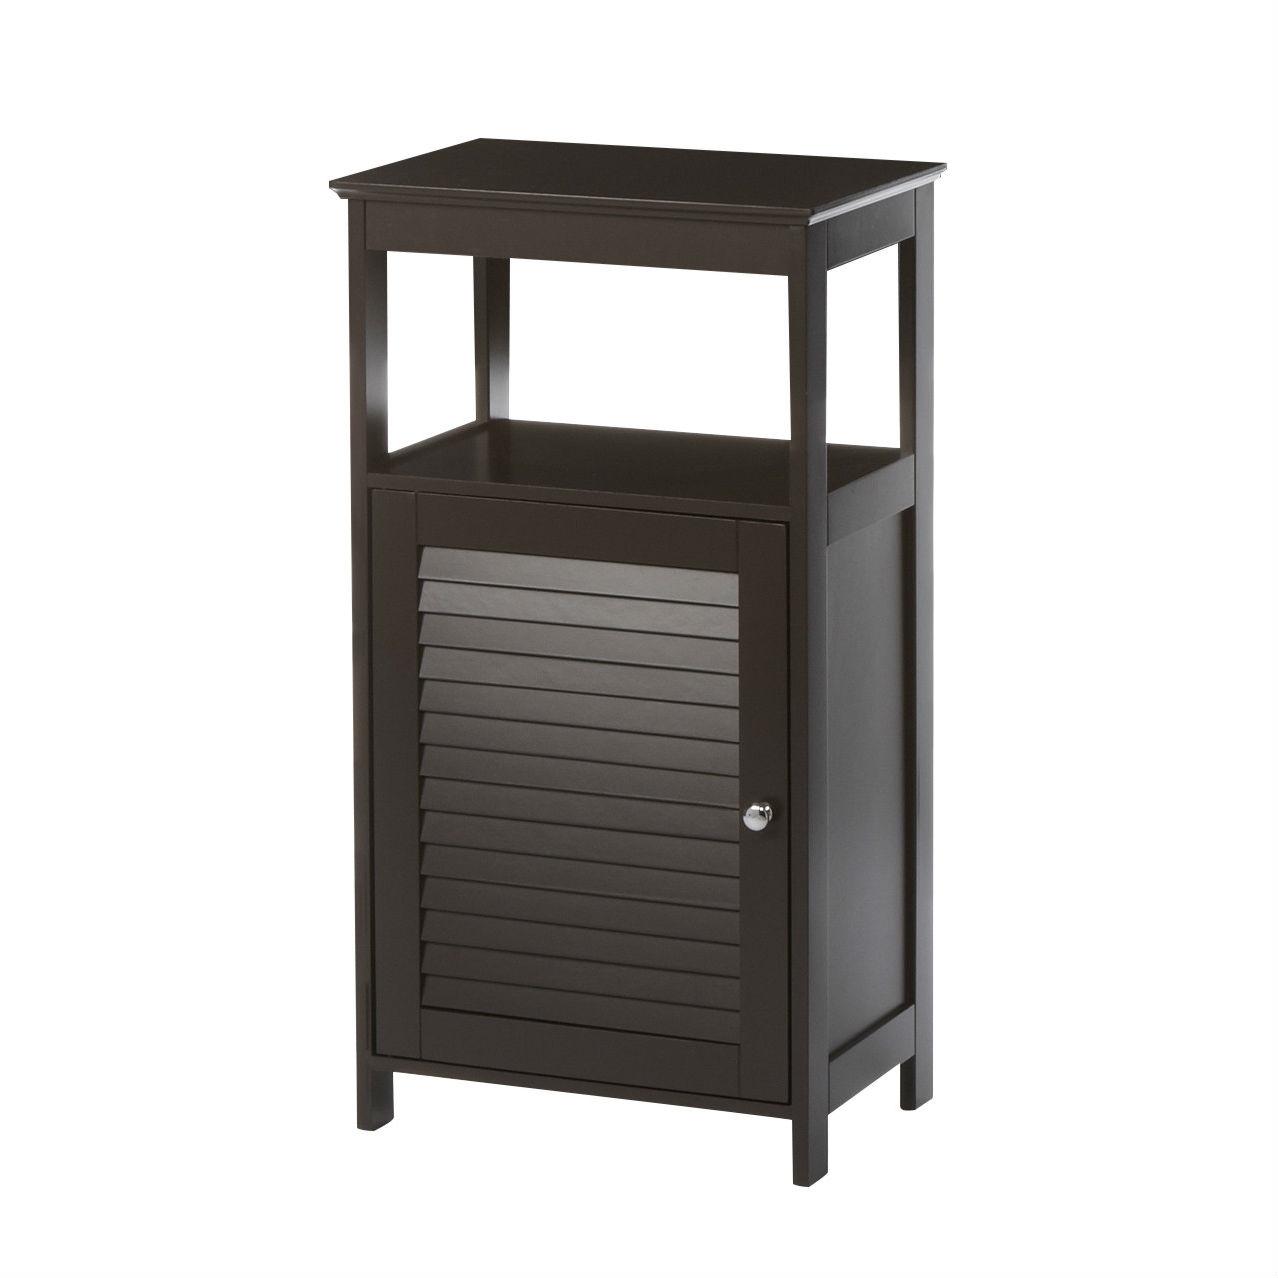 Modern Bathroom Floor Cabinet Free Standing Storage Unit In Espresso Wood Finish Fastfurnishings Com